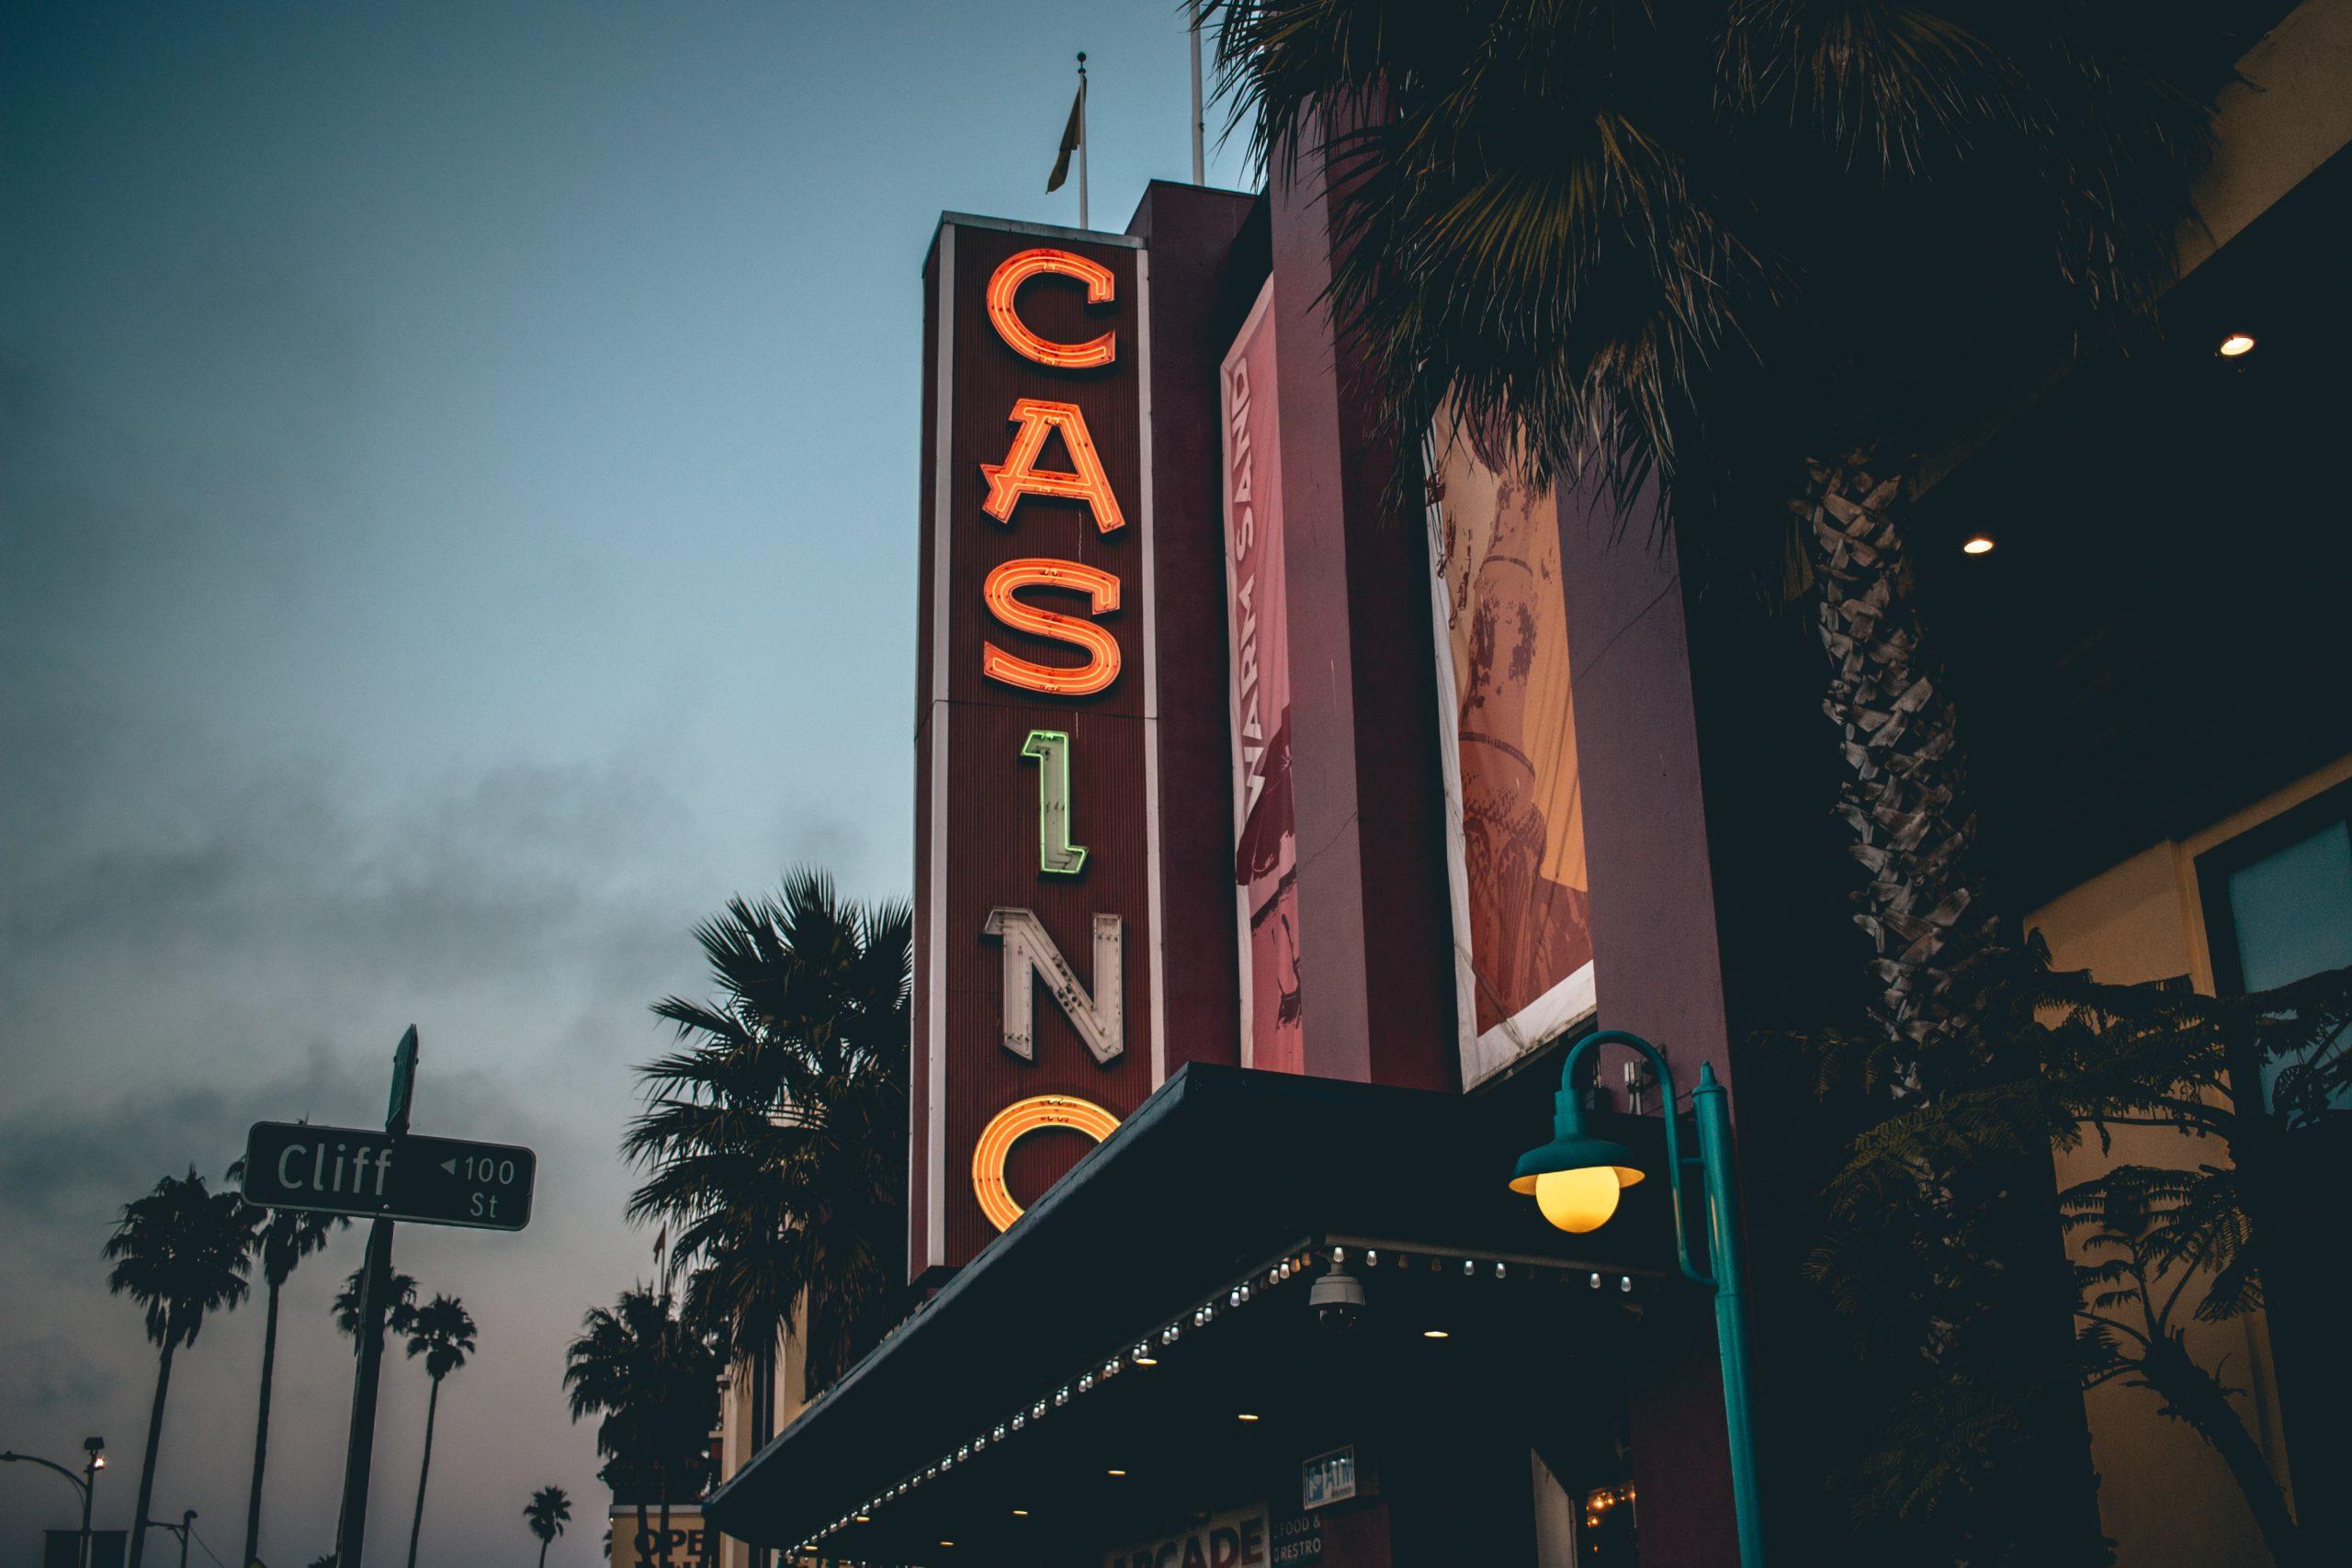 velge casino